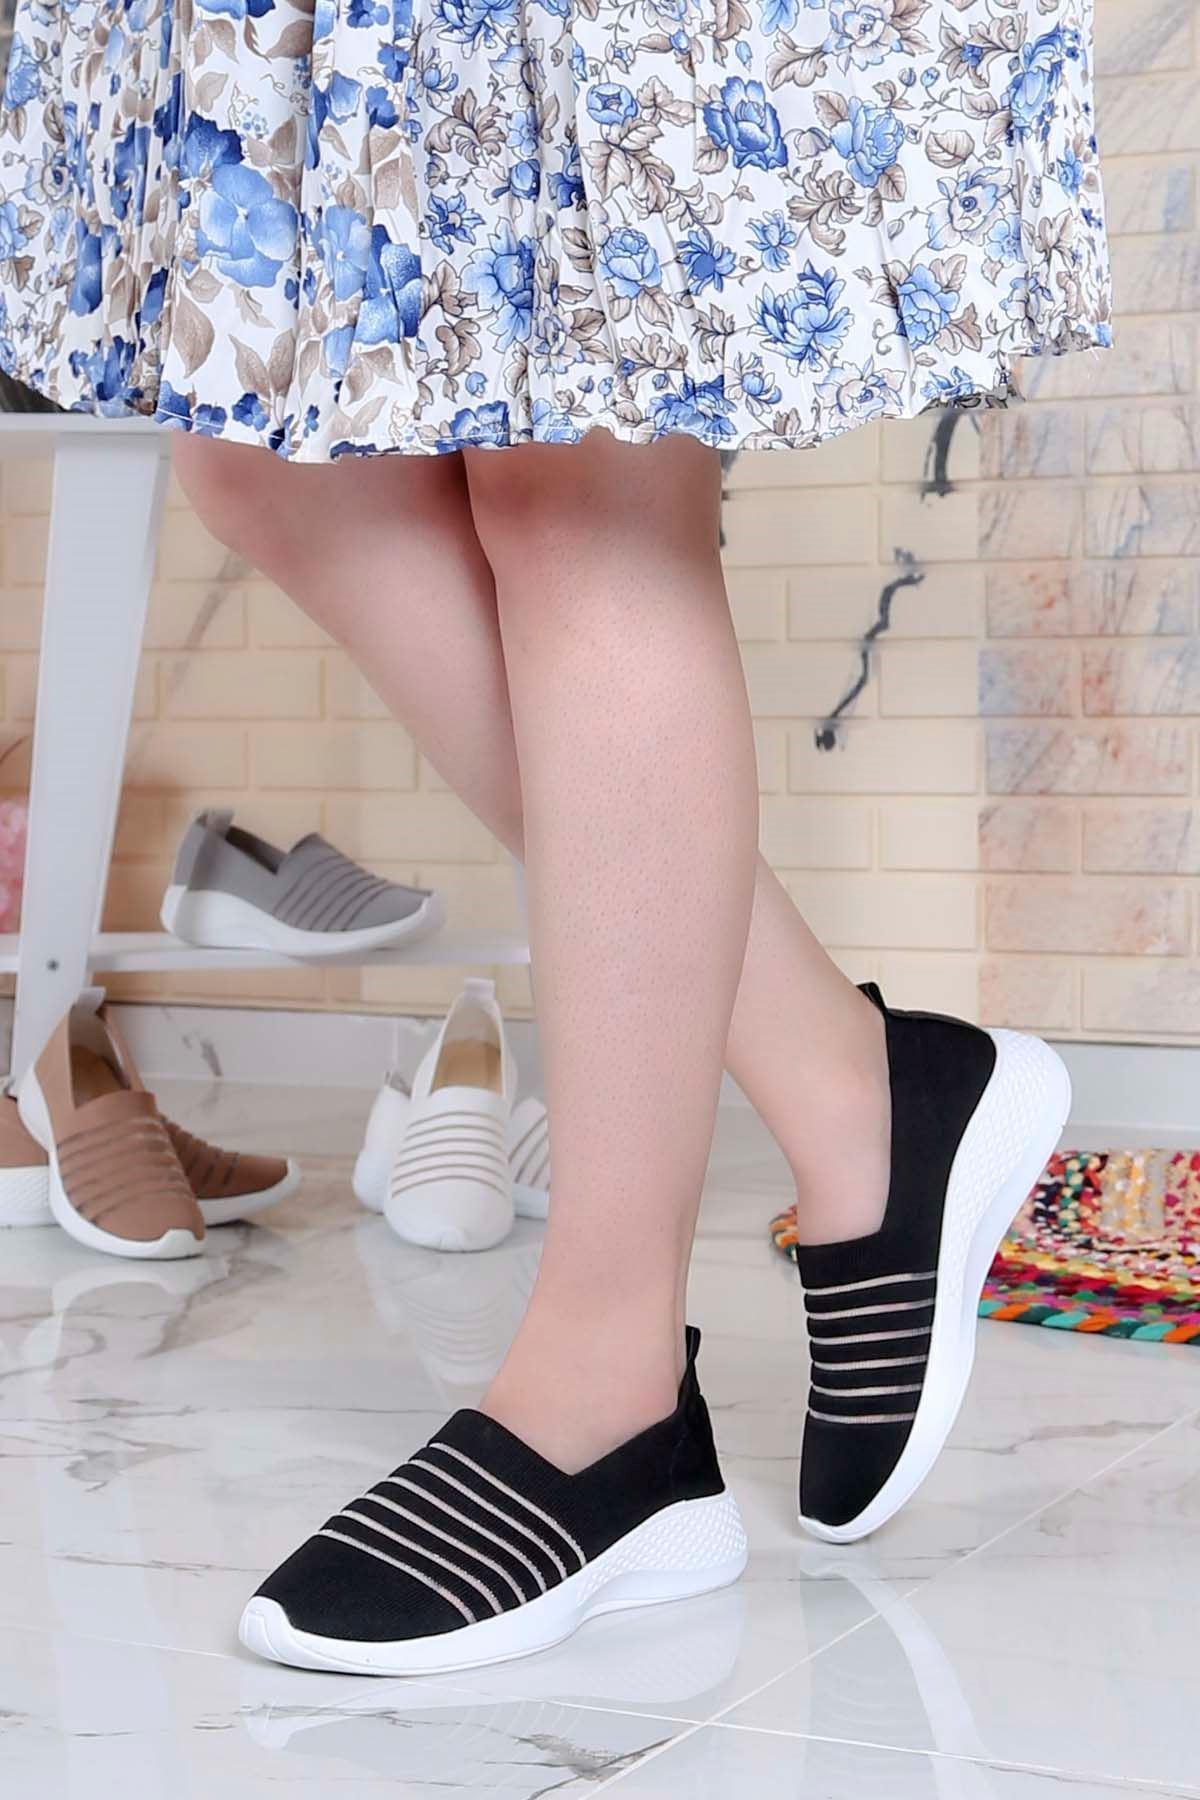 My-Fit-301 Triko Tül Detay Spor Ayakkabı Siyah